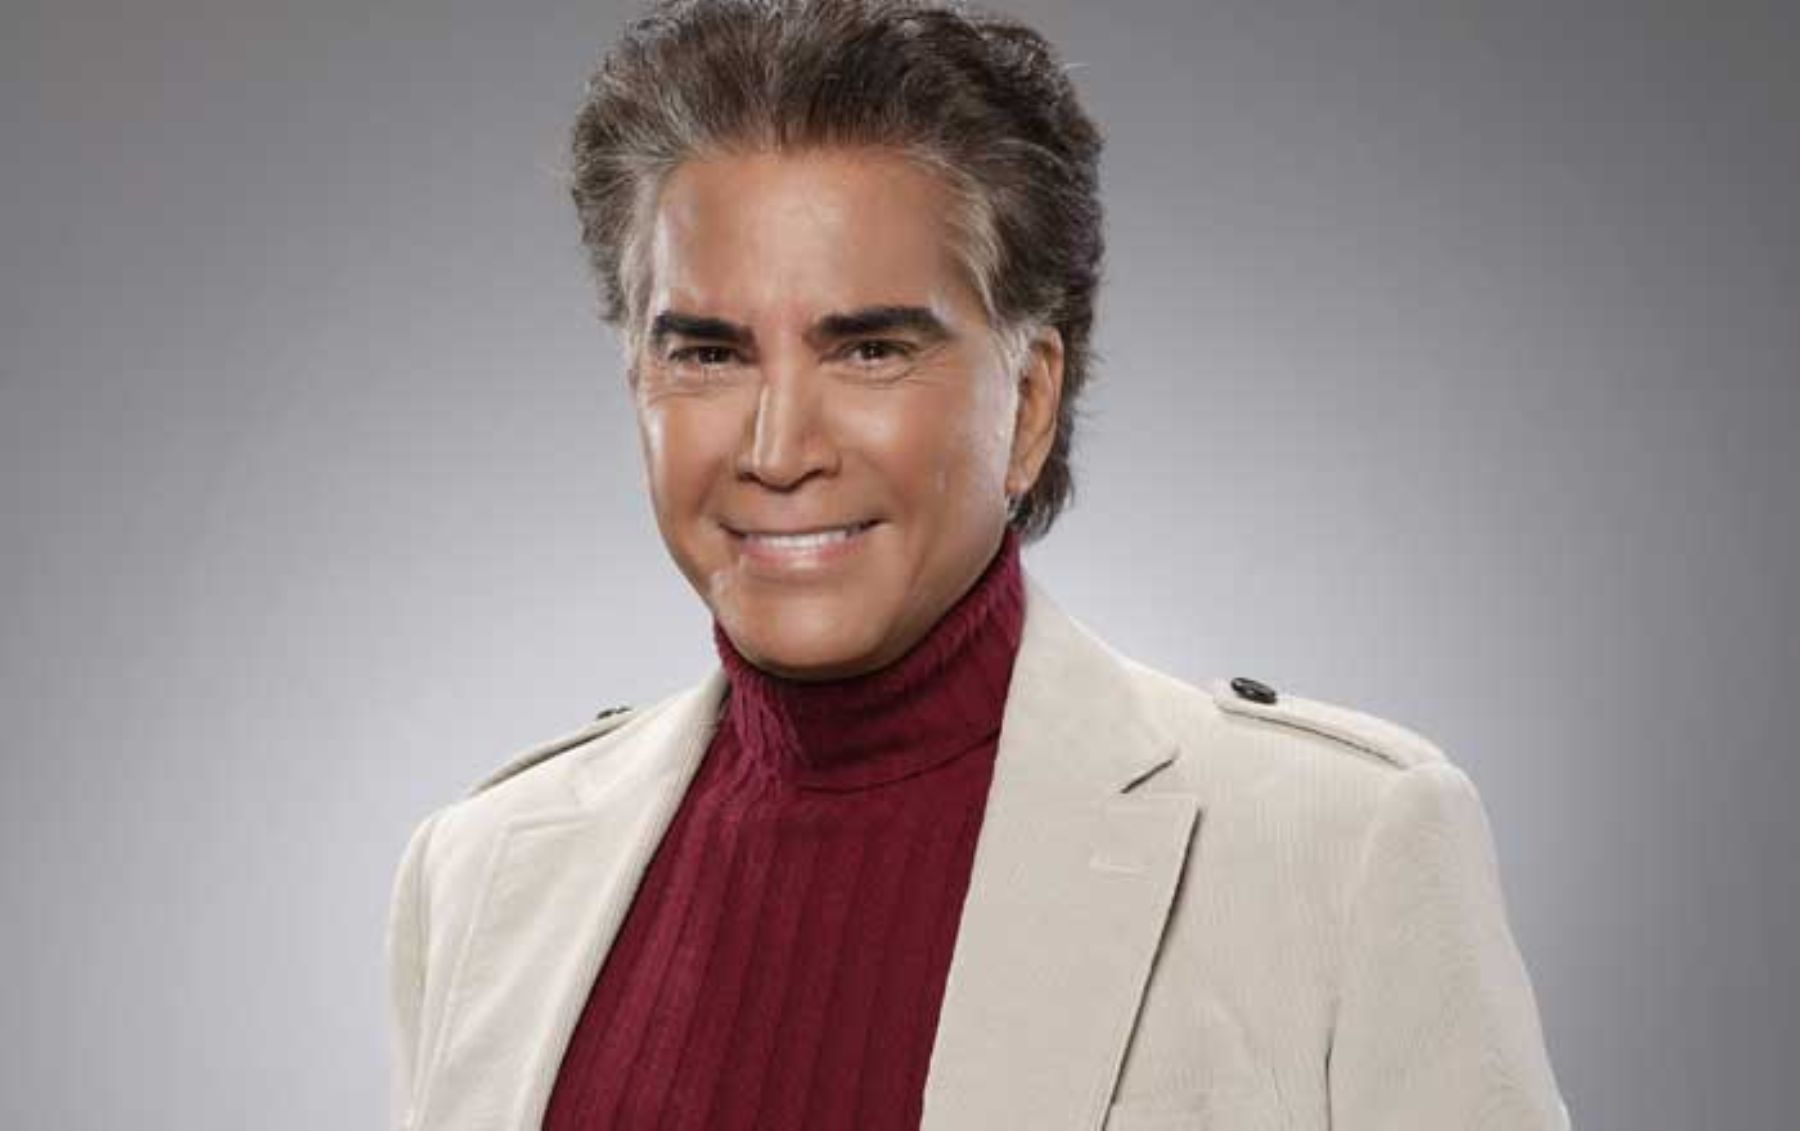 Jose Luis Rodríguez